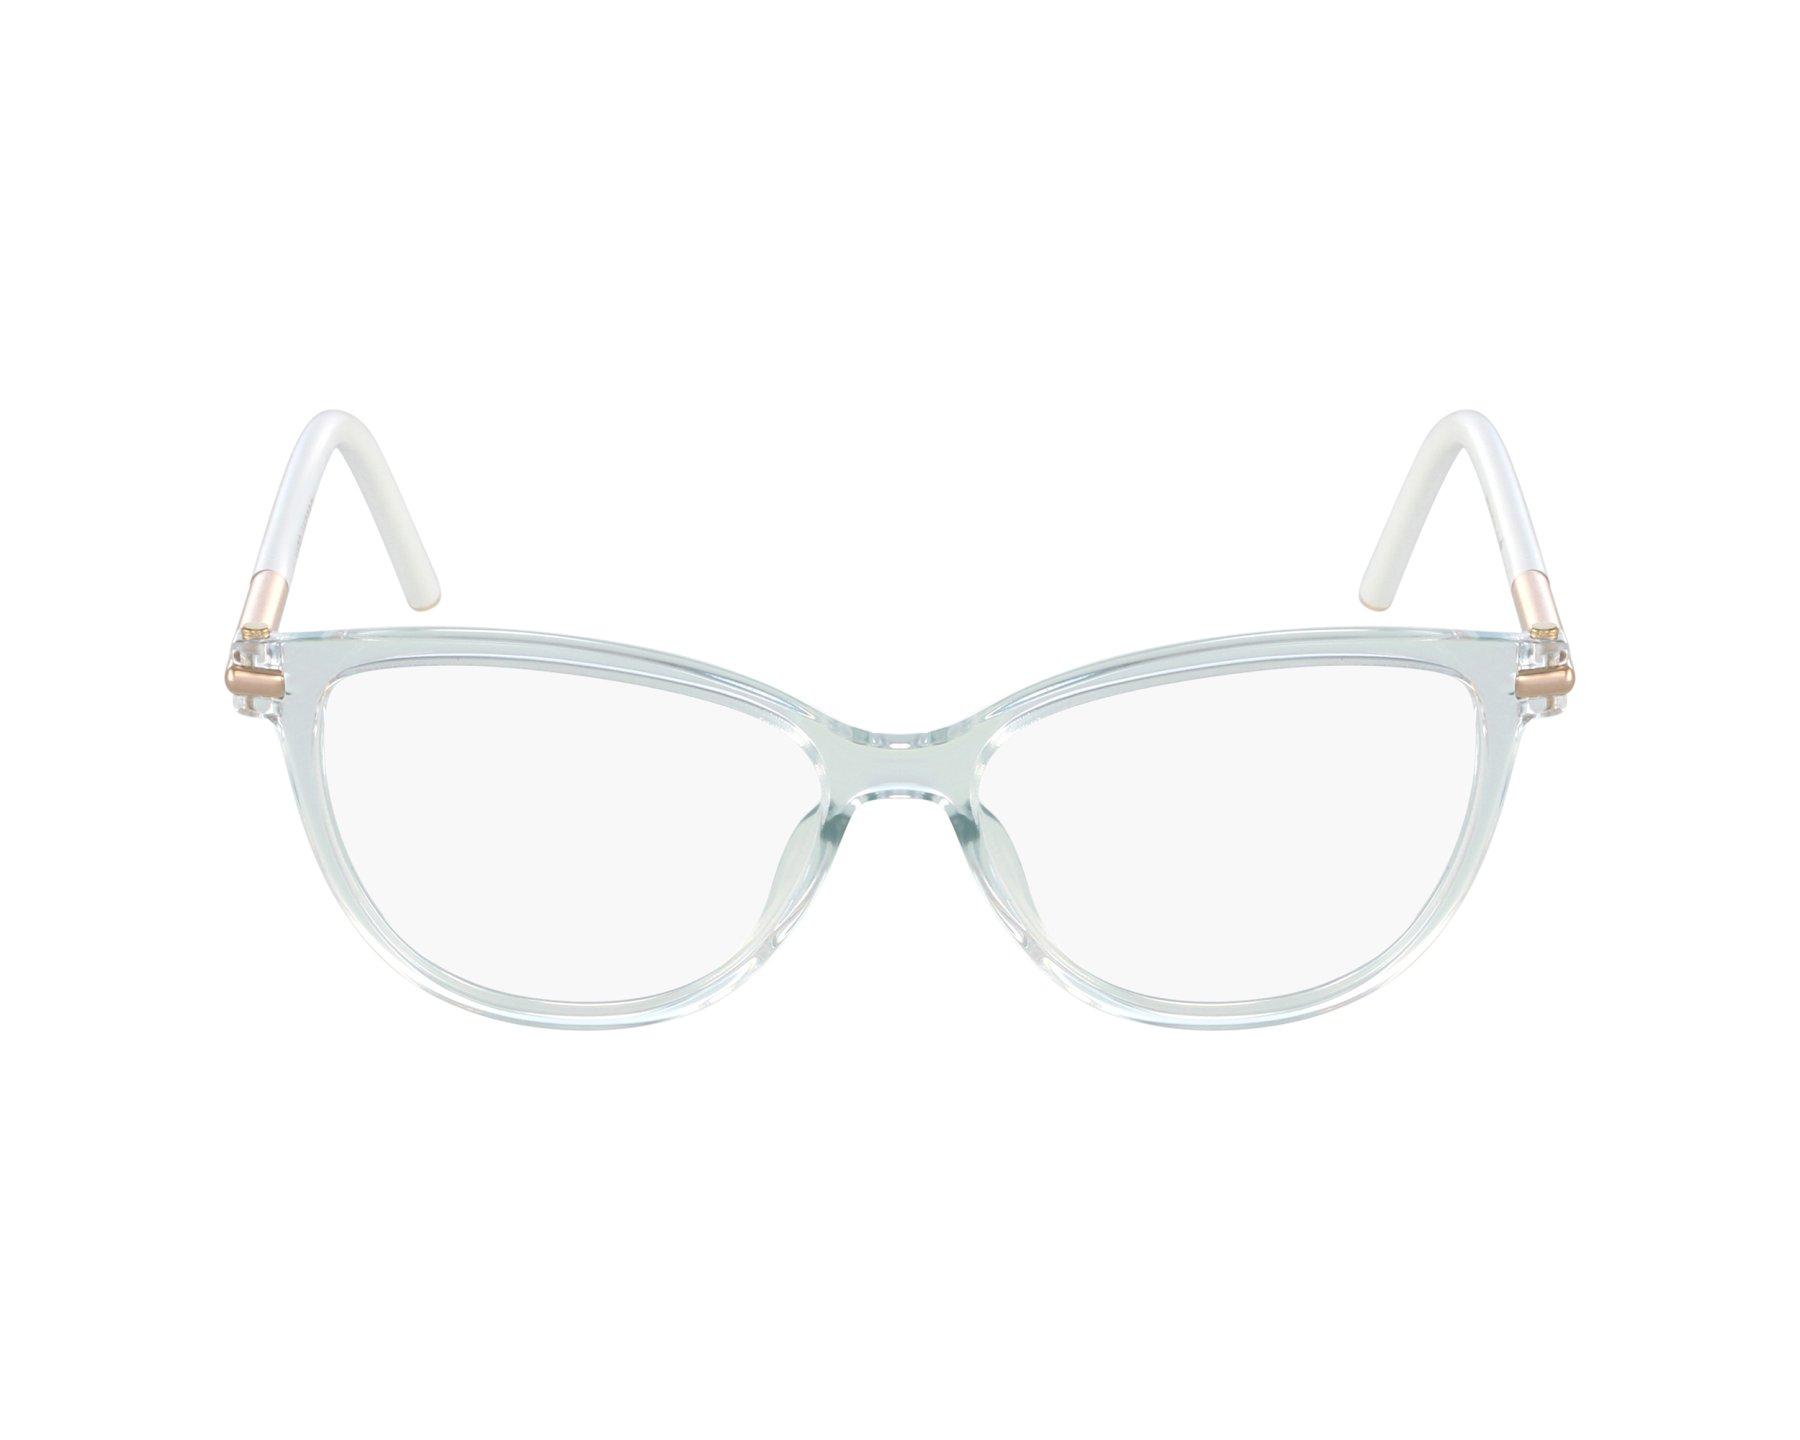 Marc Jacobs Brille MARC-50 E02 Transparent - Gläser: